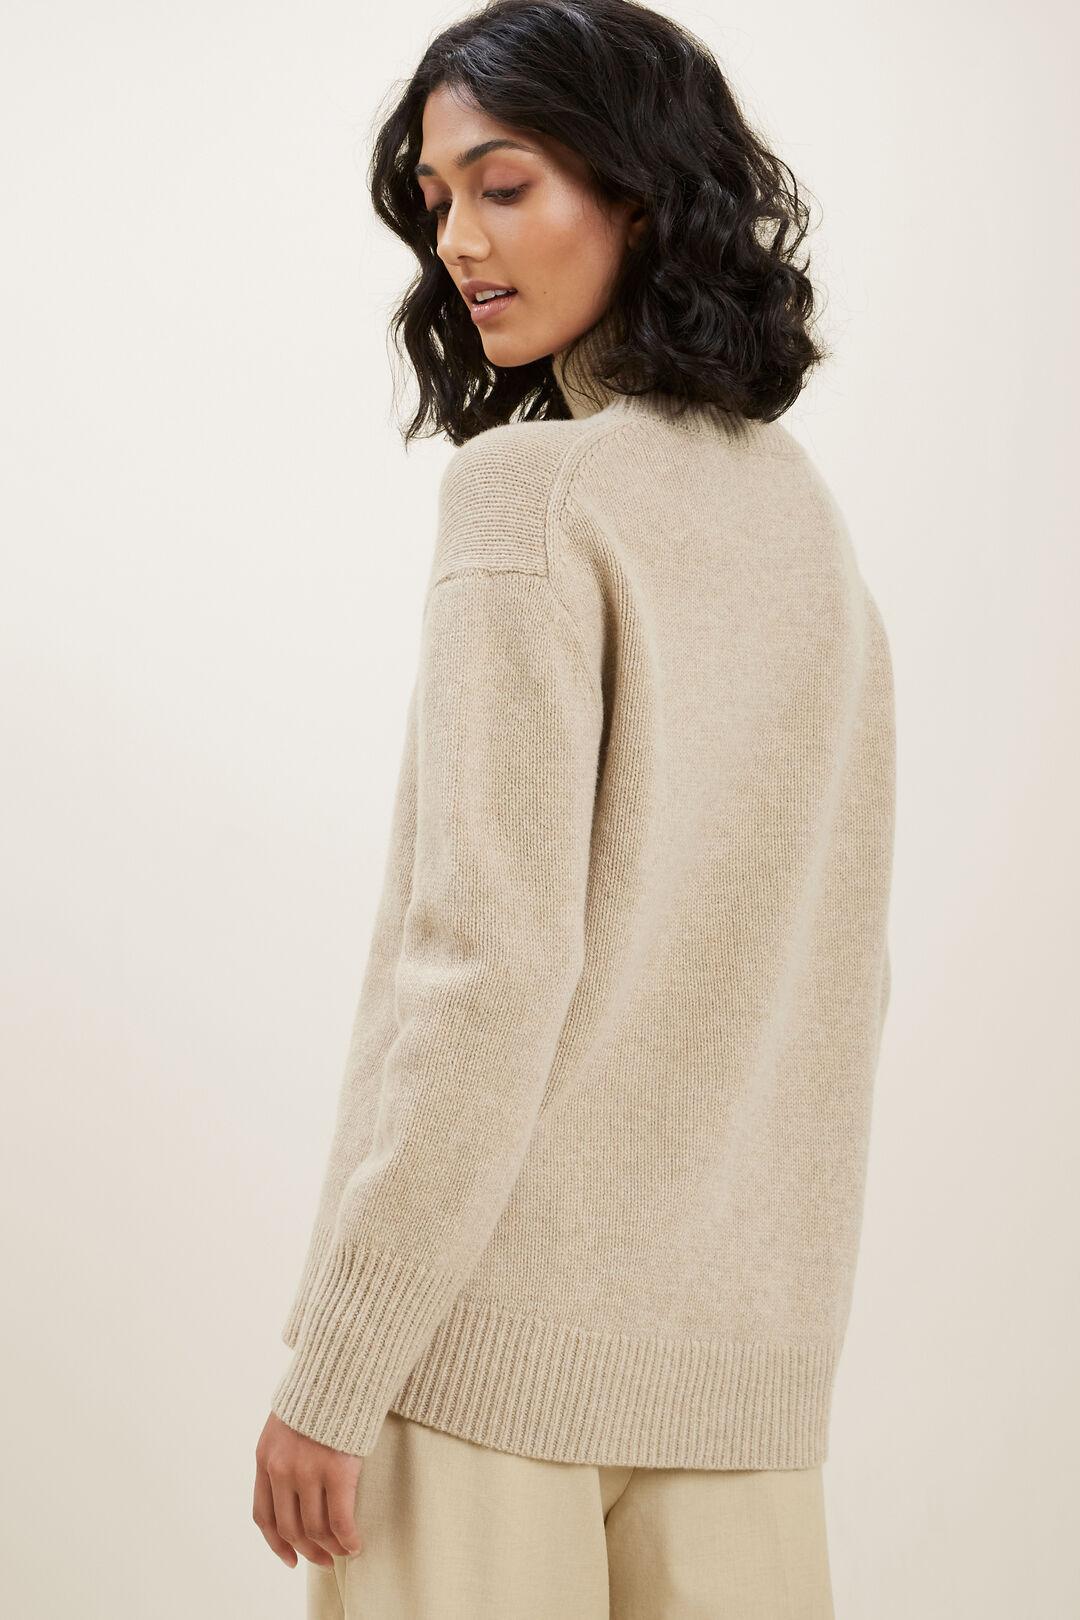 High Neck Wool Sweater  Champagne Beige Marle  hi-res